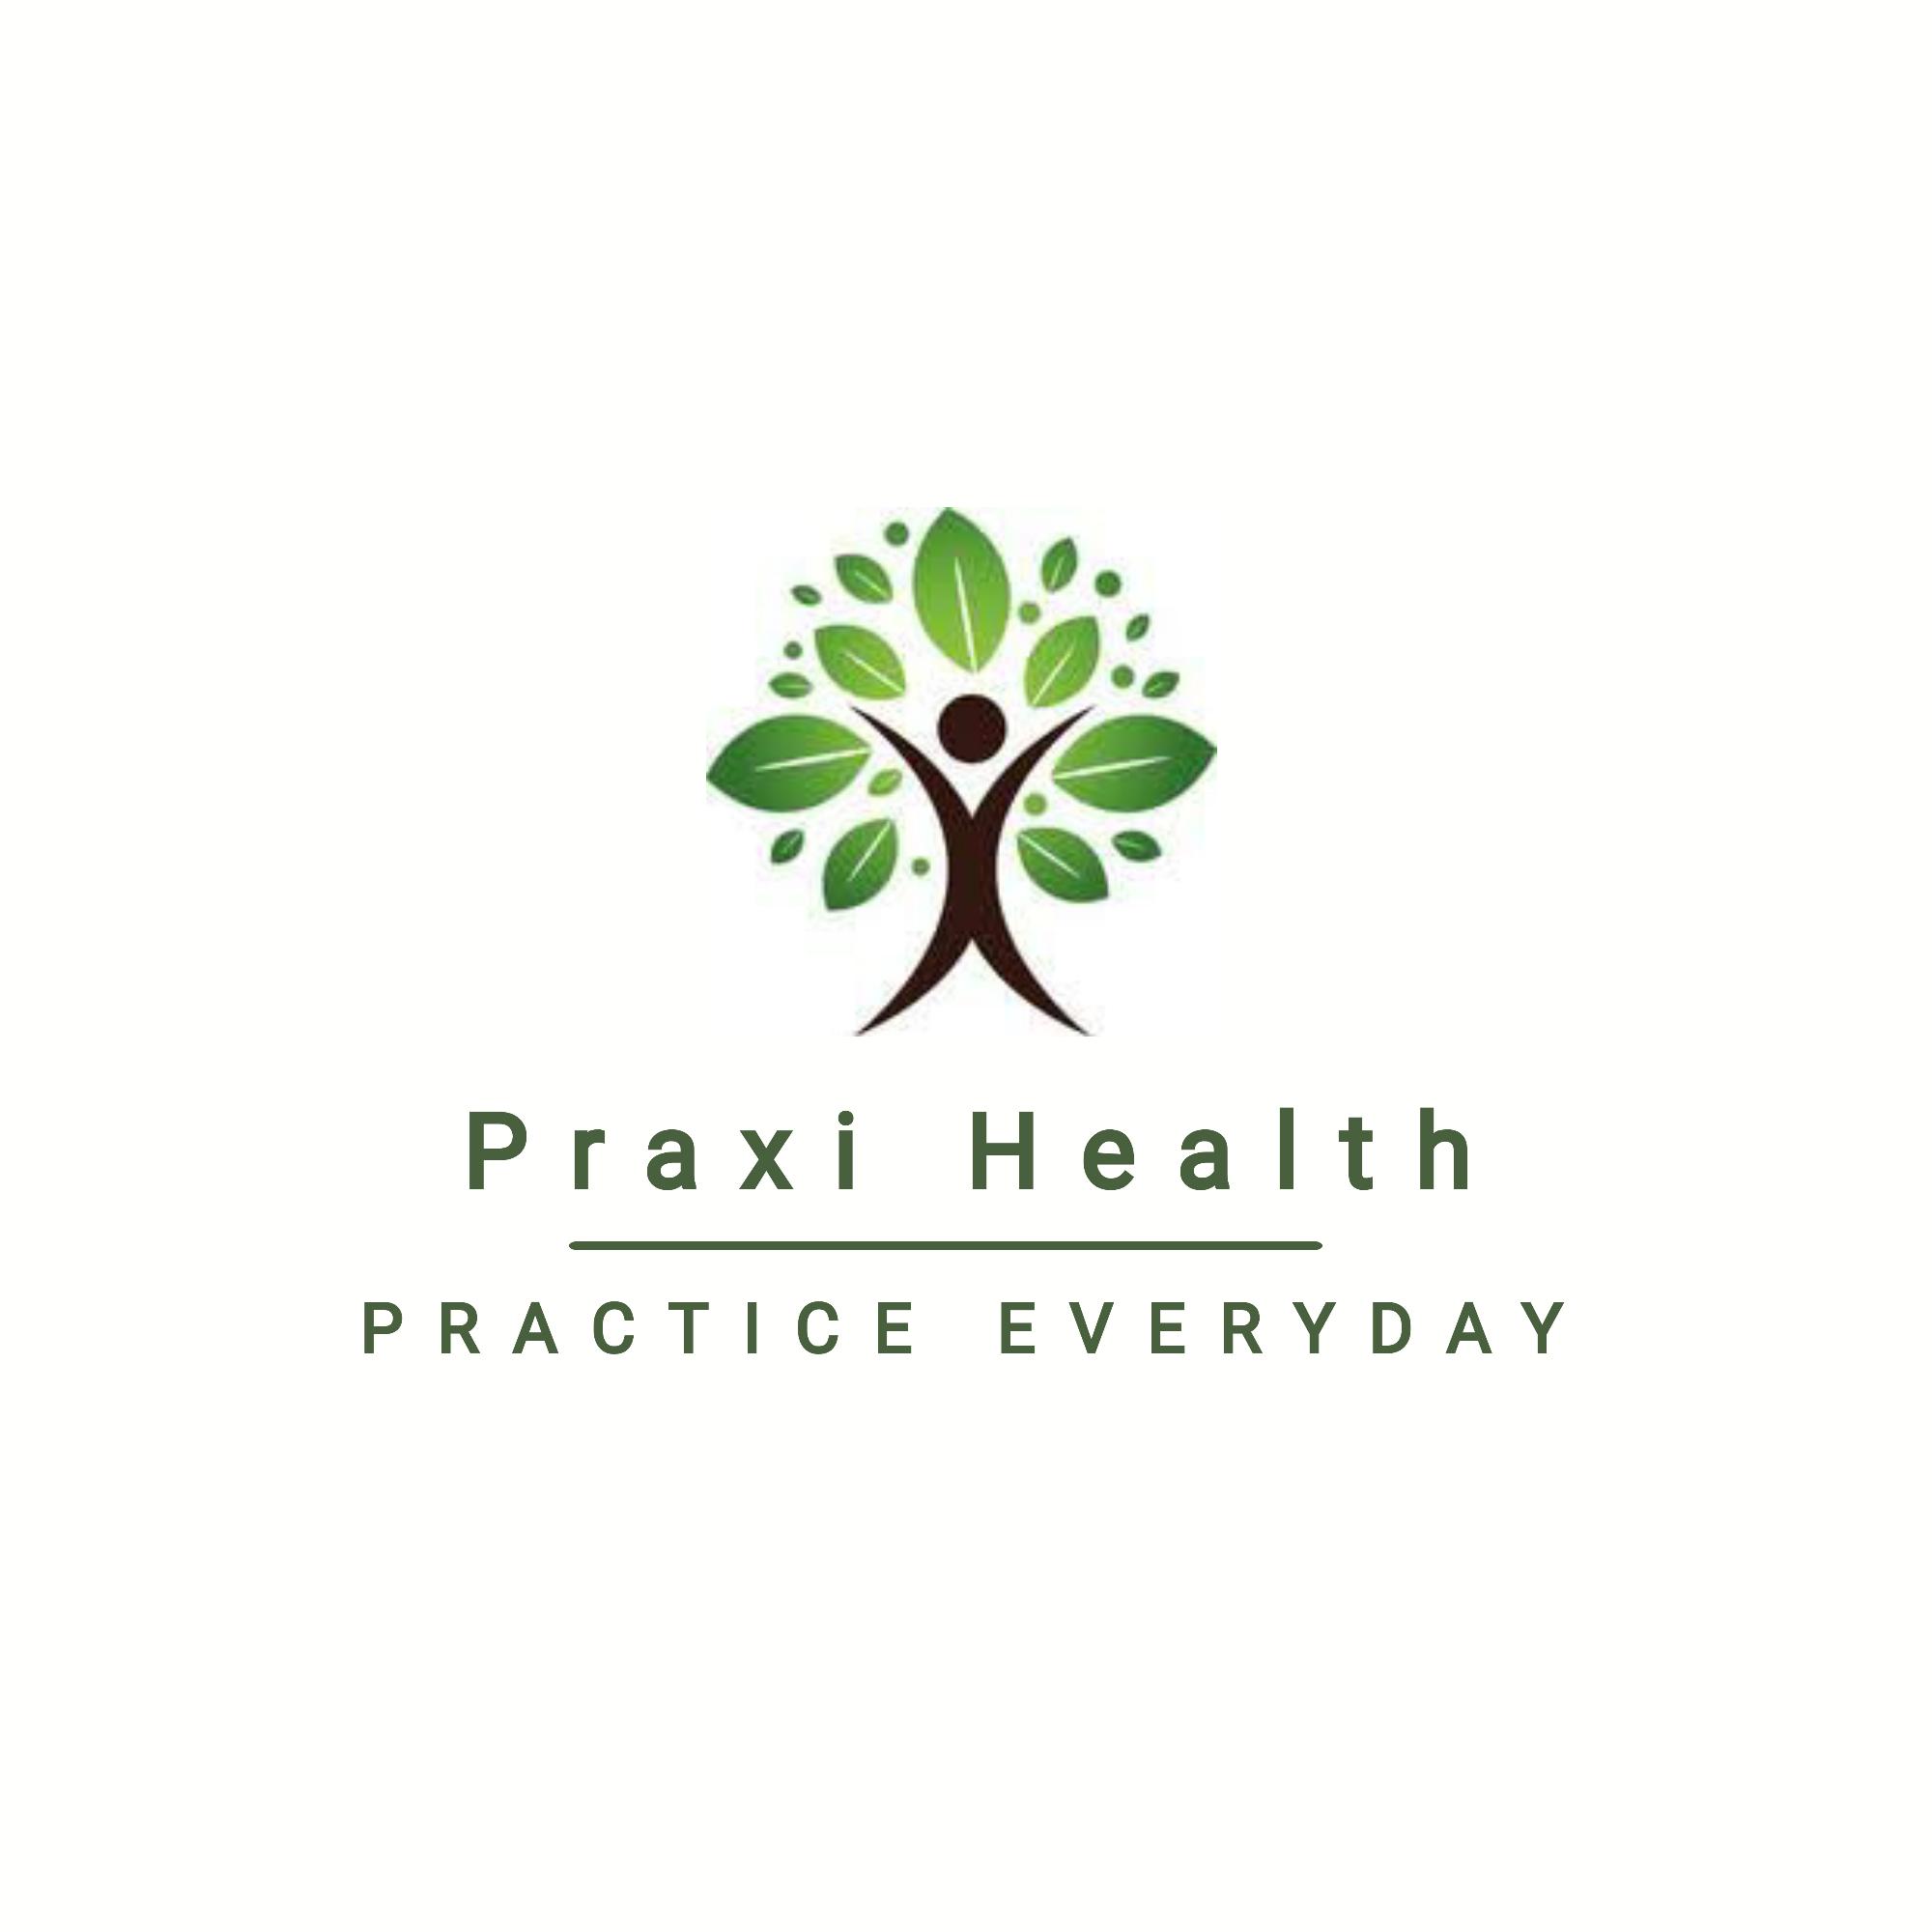 Praxi Health